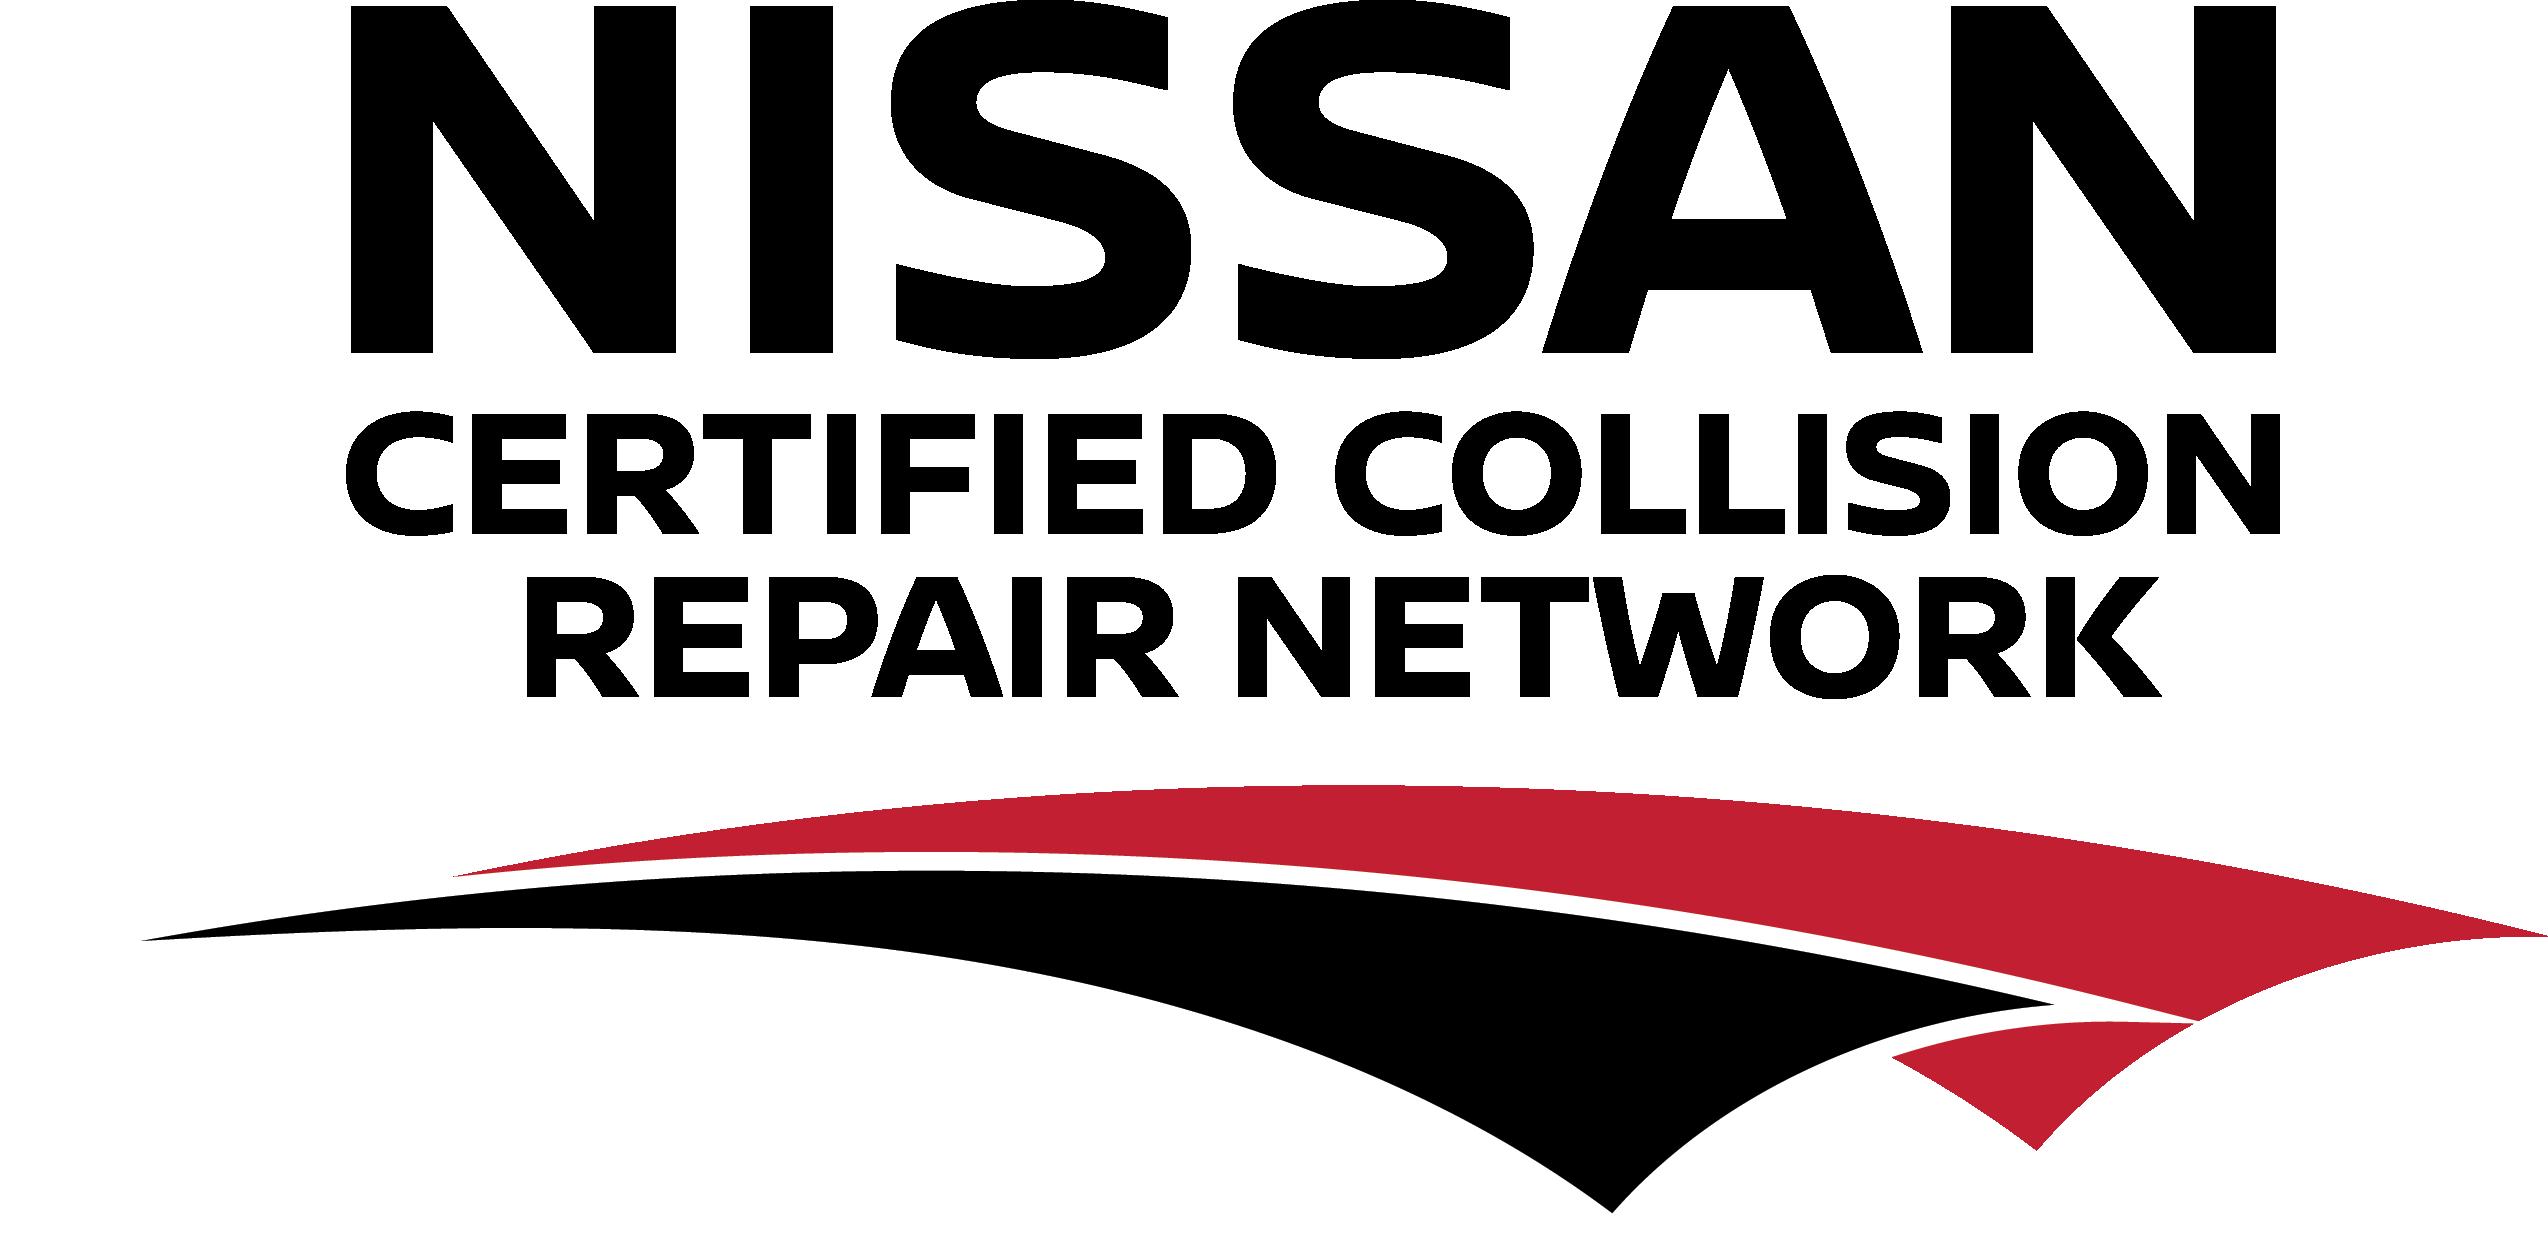 https://secureservercdn.net/50.62.174.189/m7t.e20.myftpupload.com/wp-content/uploads/2021/06/Nissan-CRN-Logo_BLK.png